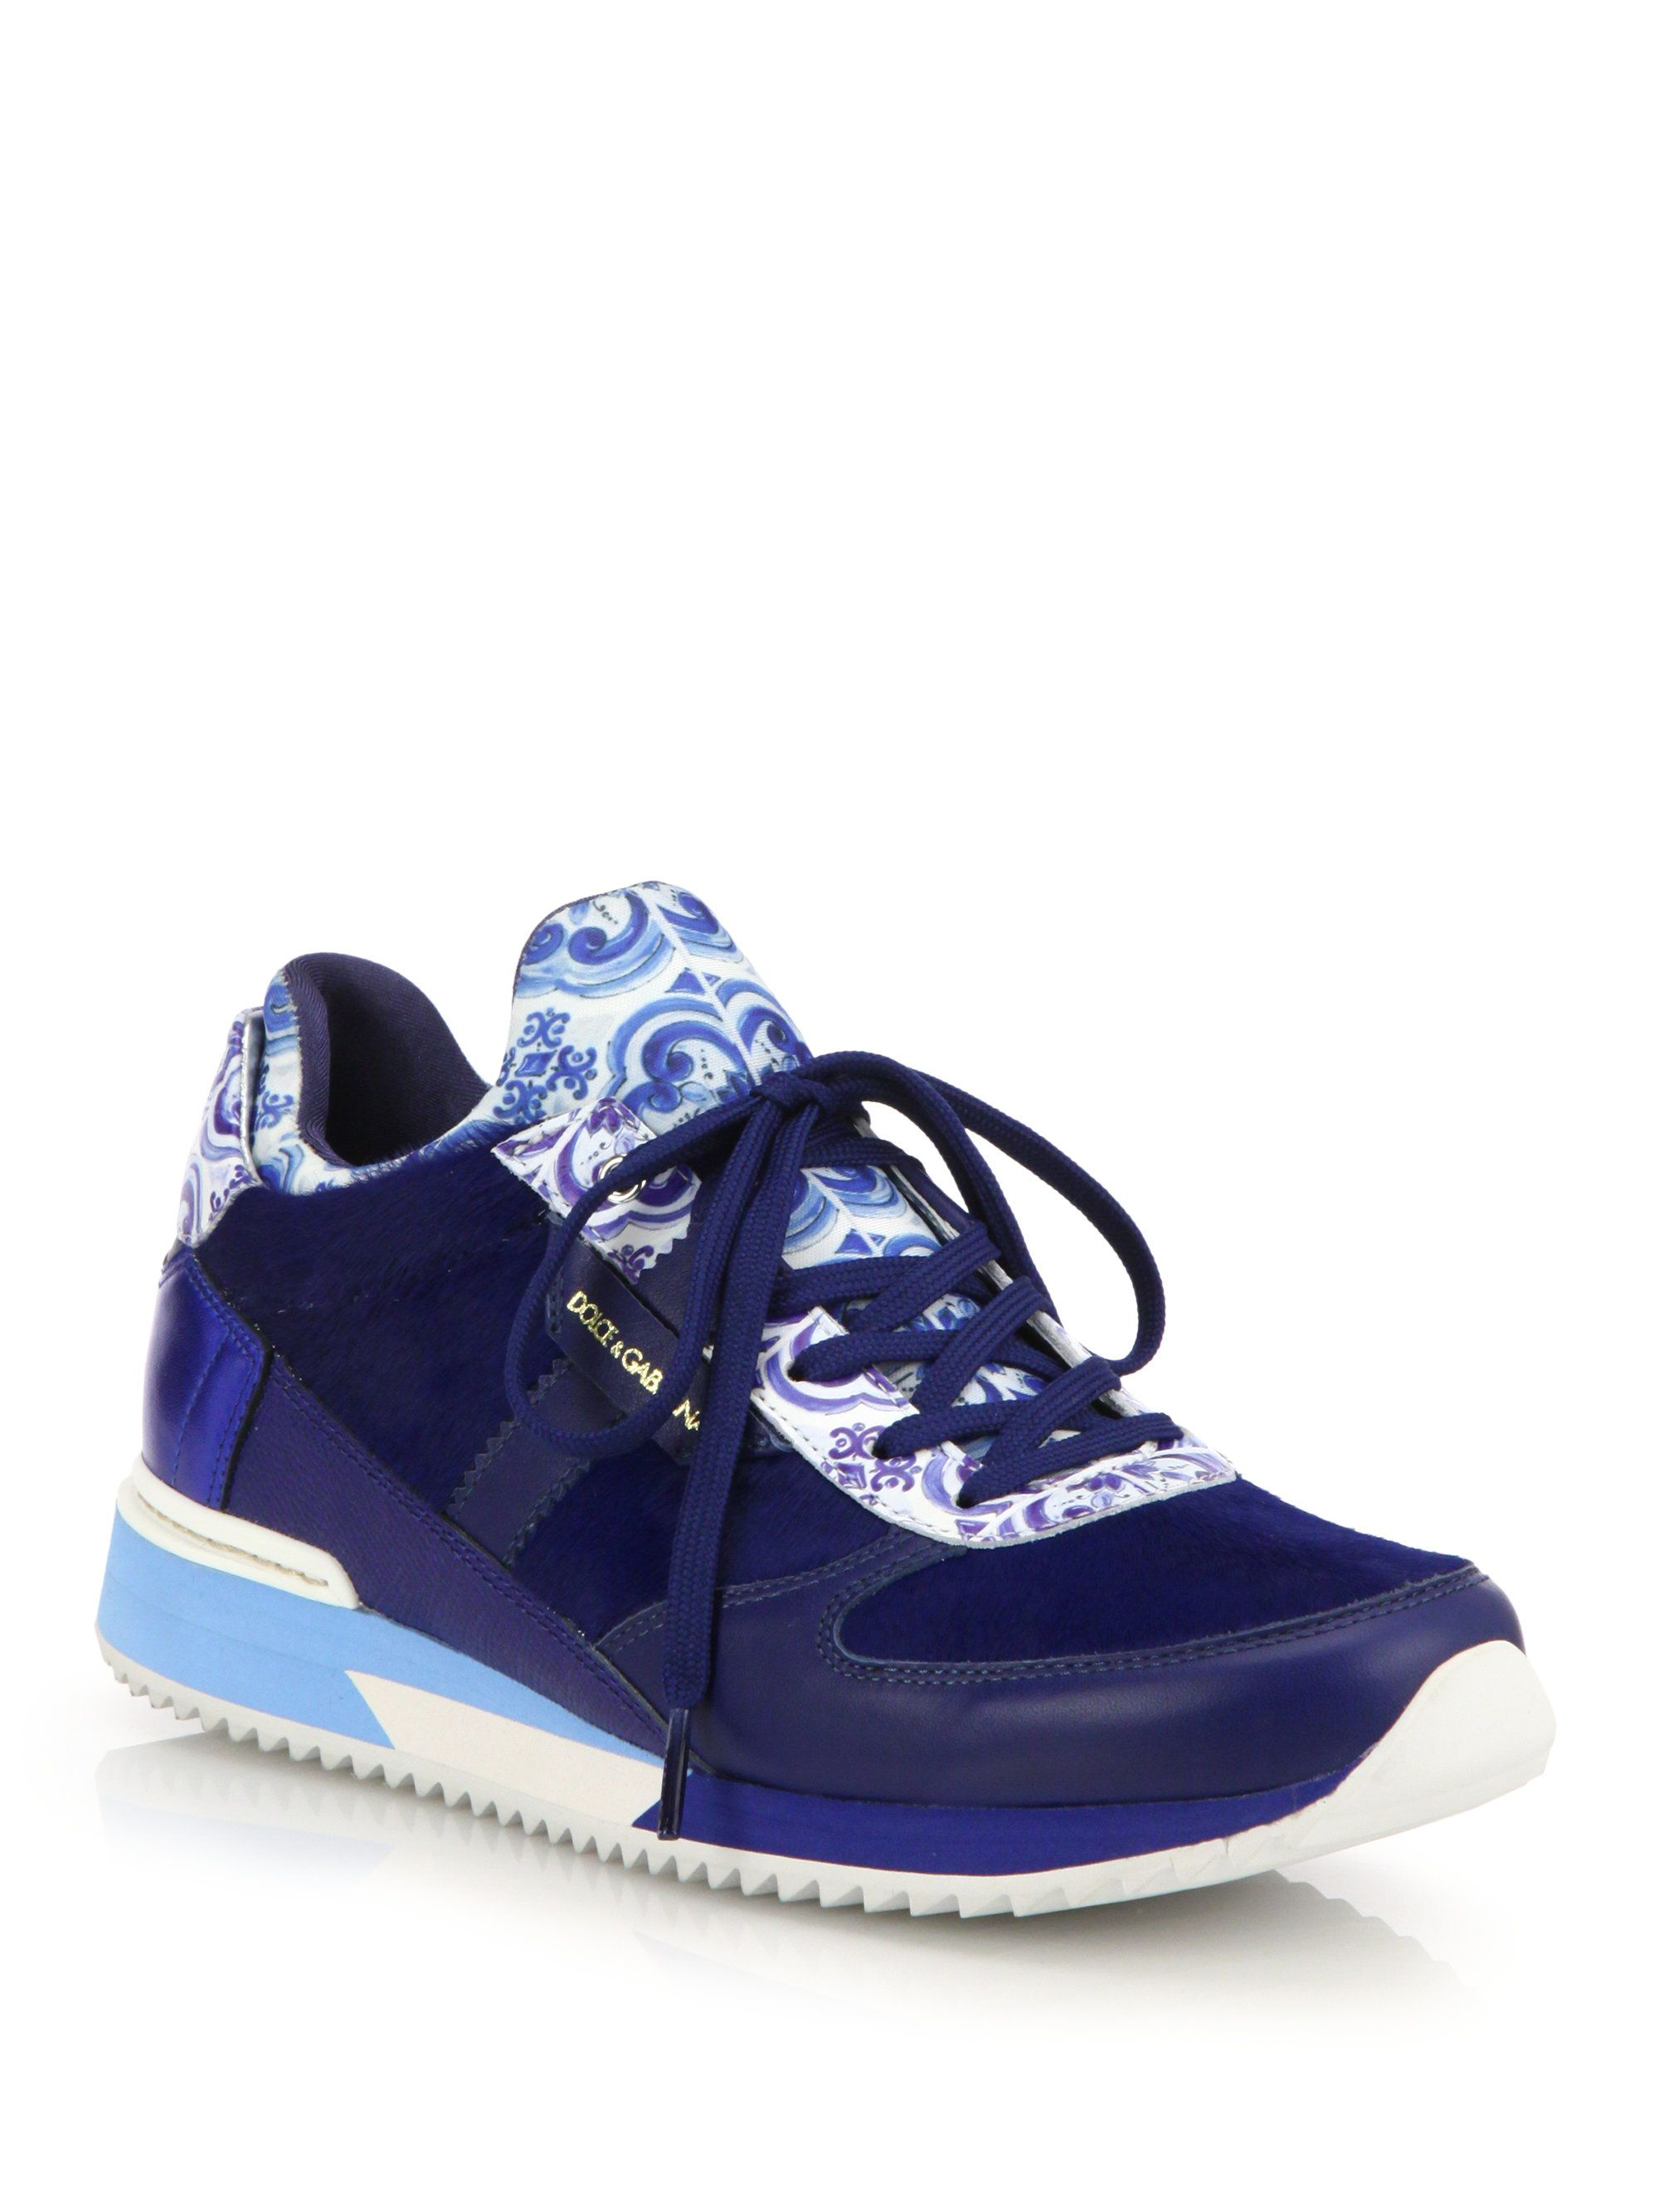 2e6e6b0cba Women's Blue Tile-Print Leather & Calf Hair Sneakers | Couture: Tile ...